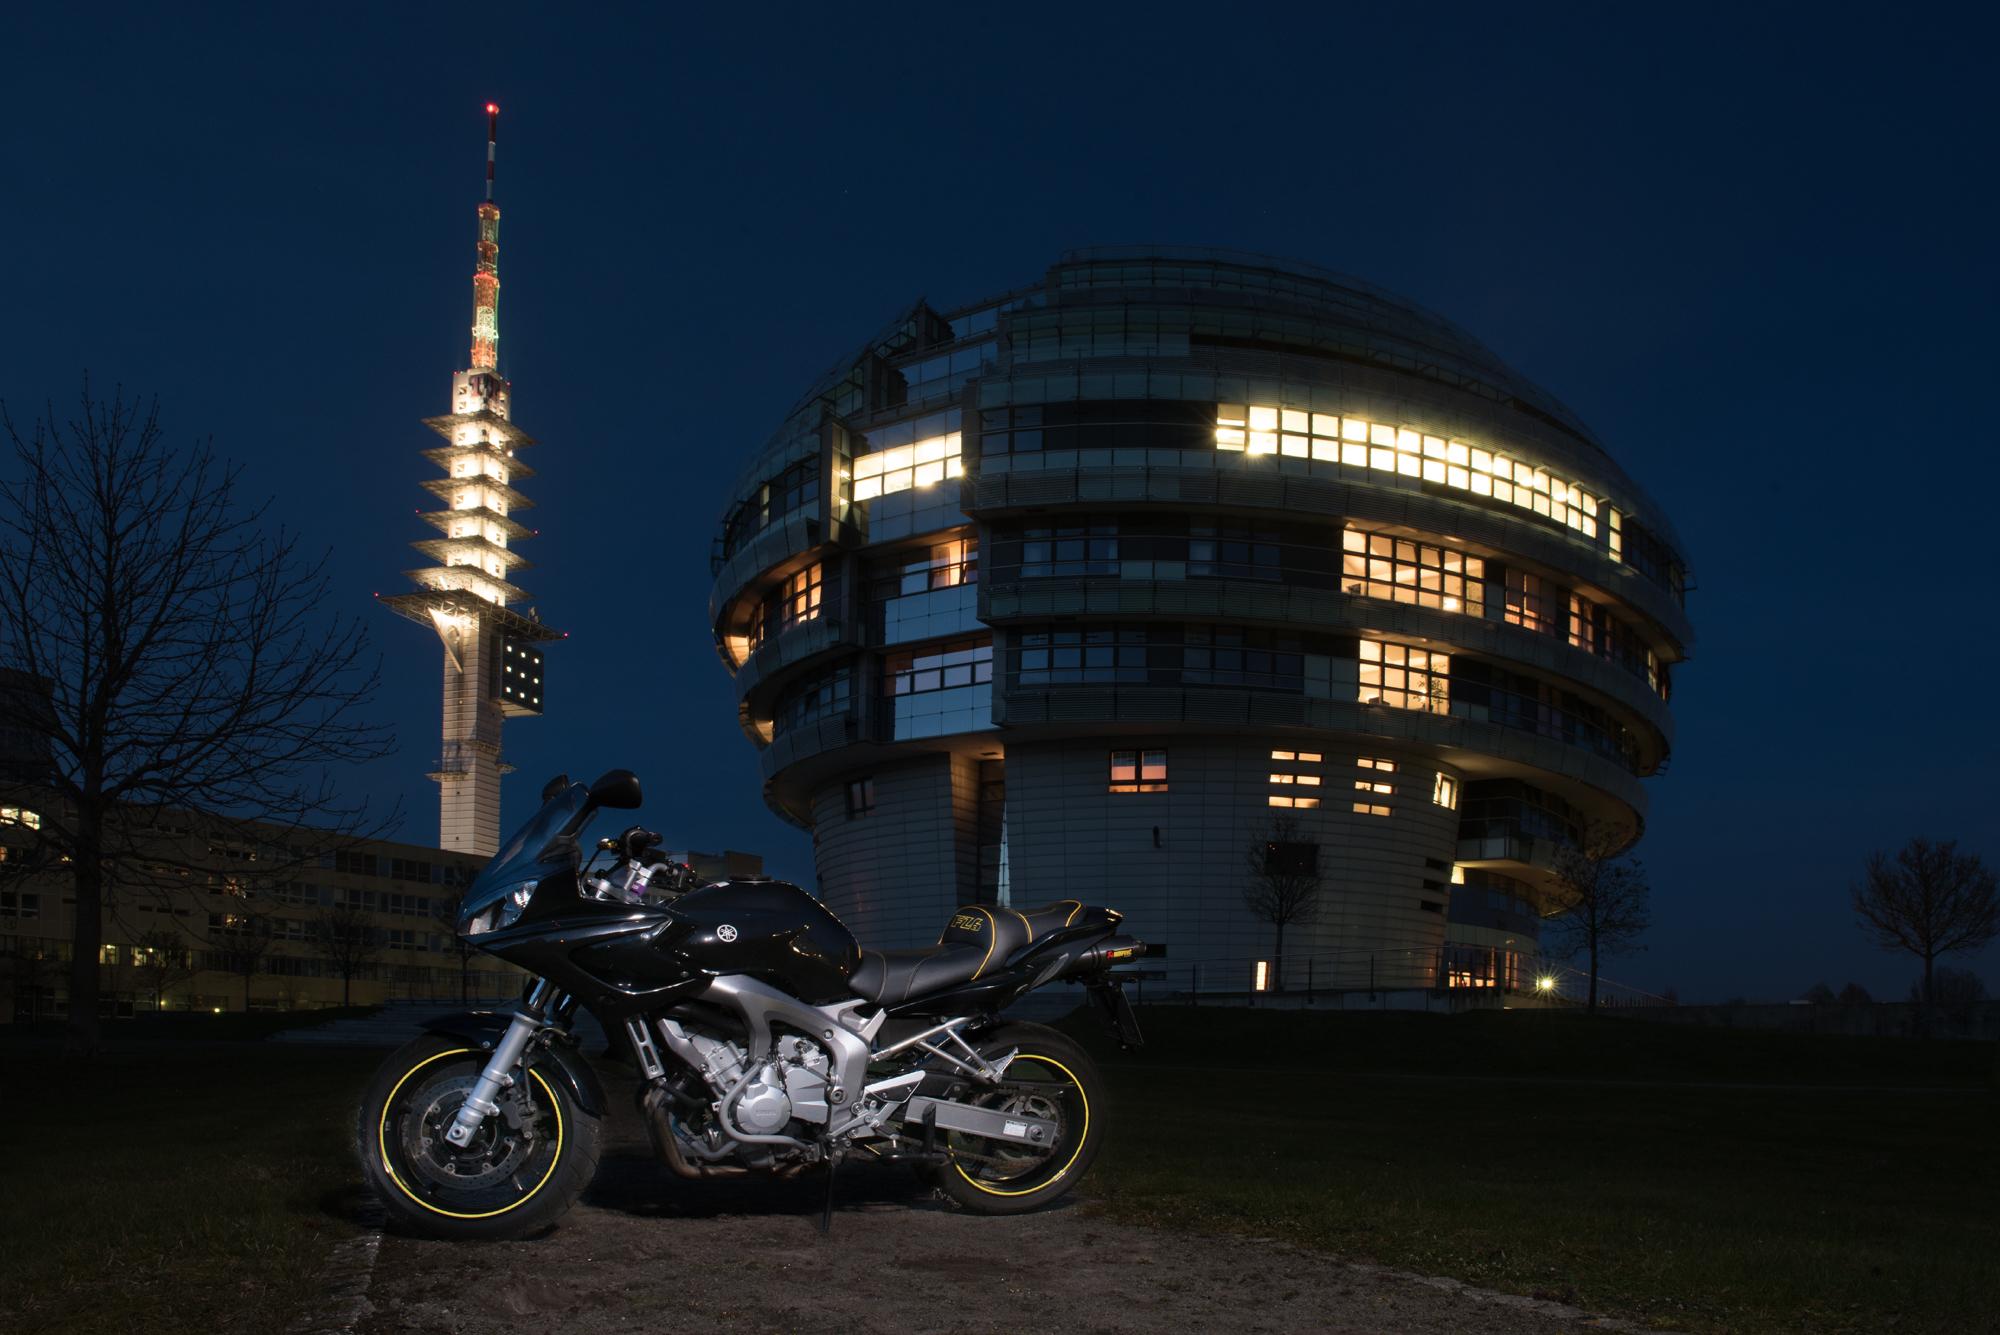 A magic hour photoshoot with my bike